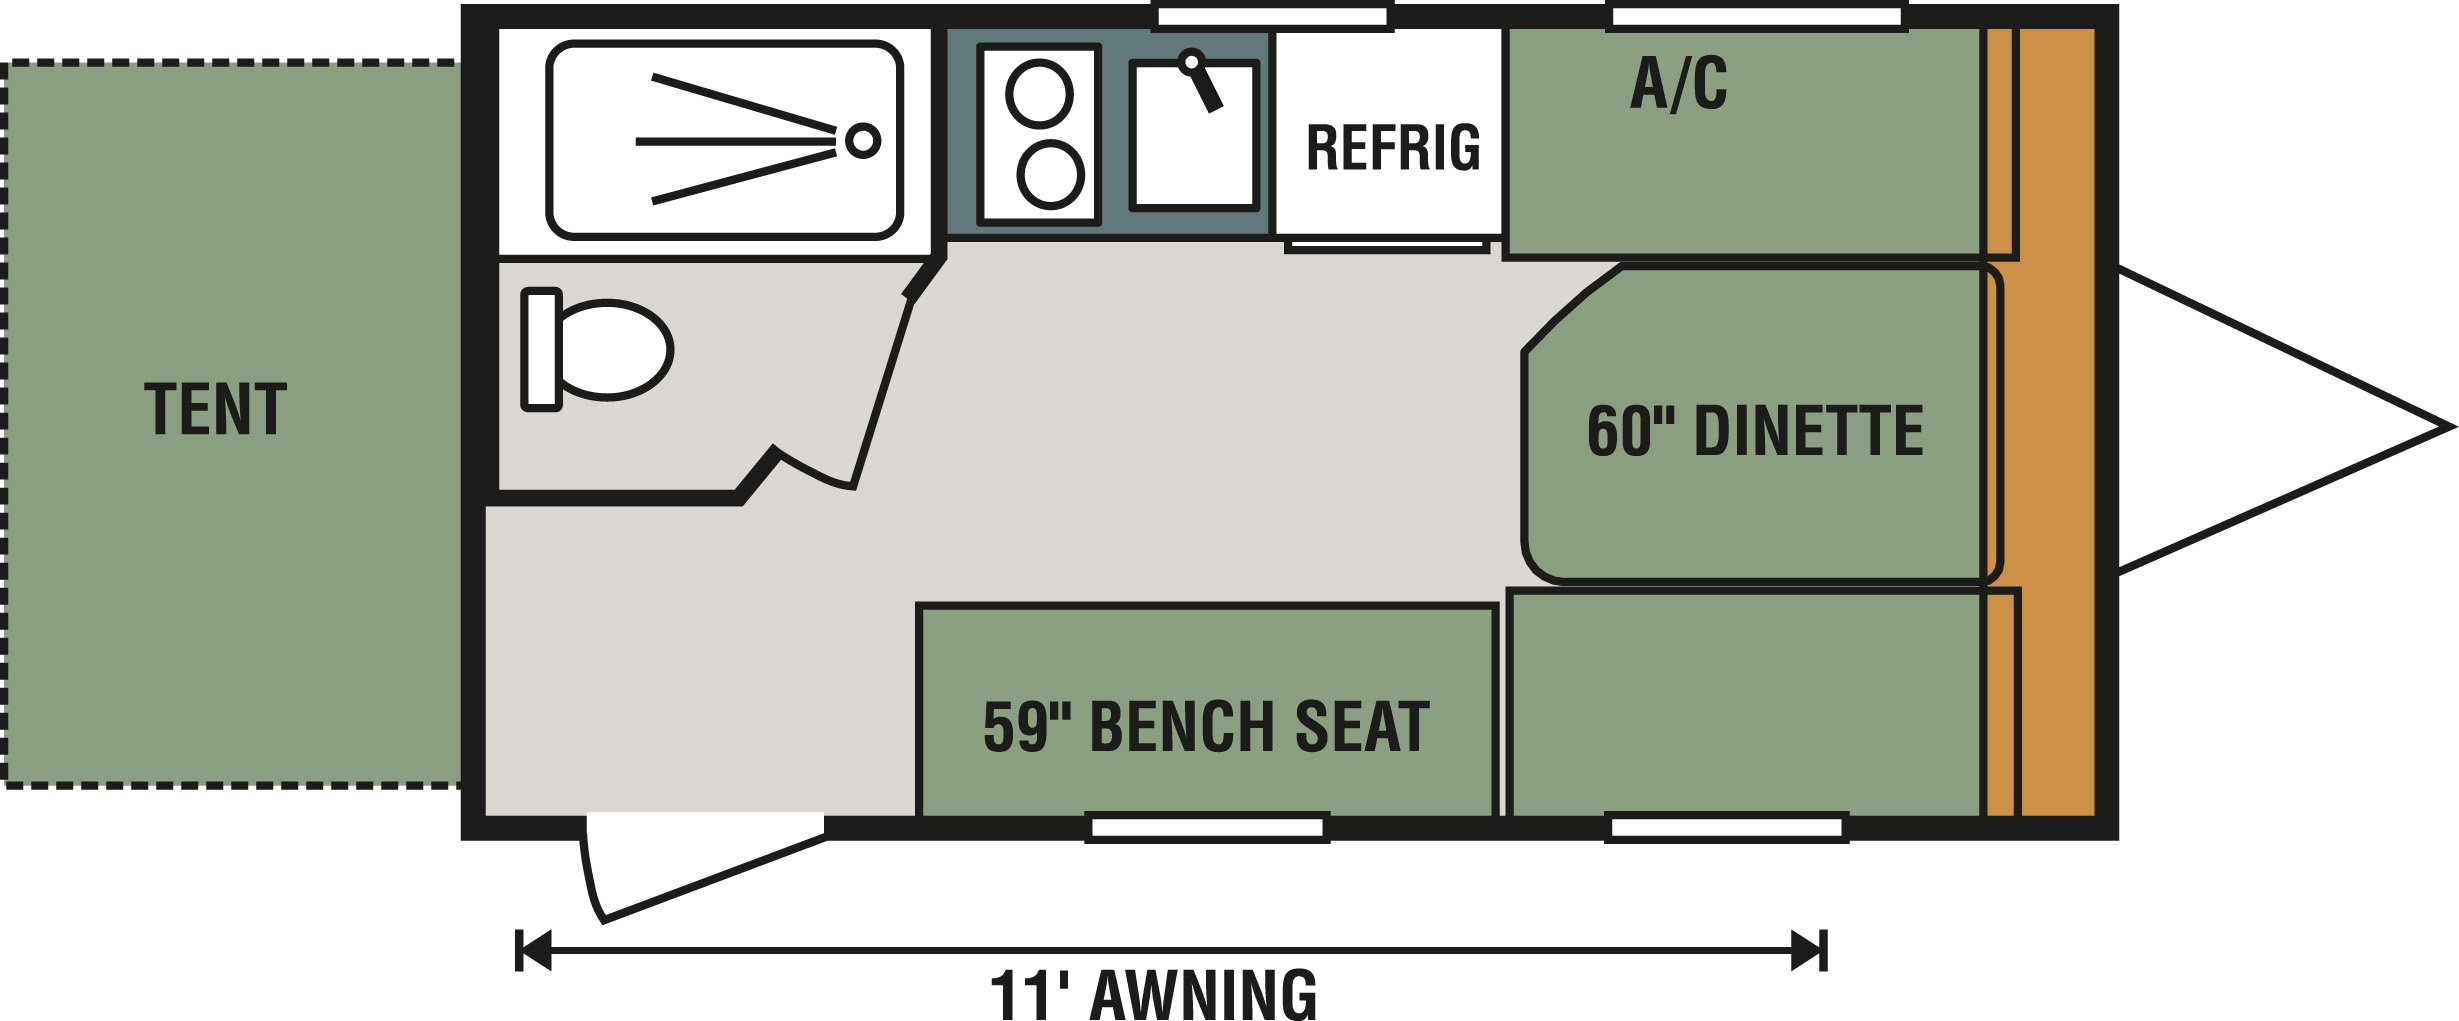 150RBT Floorplan